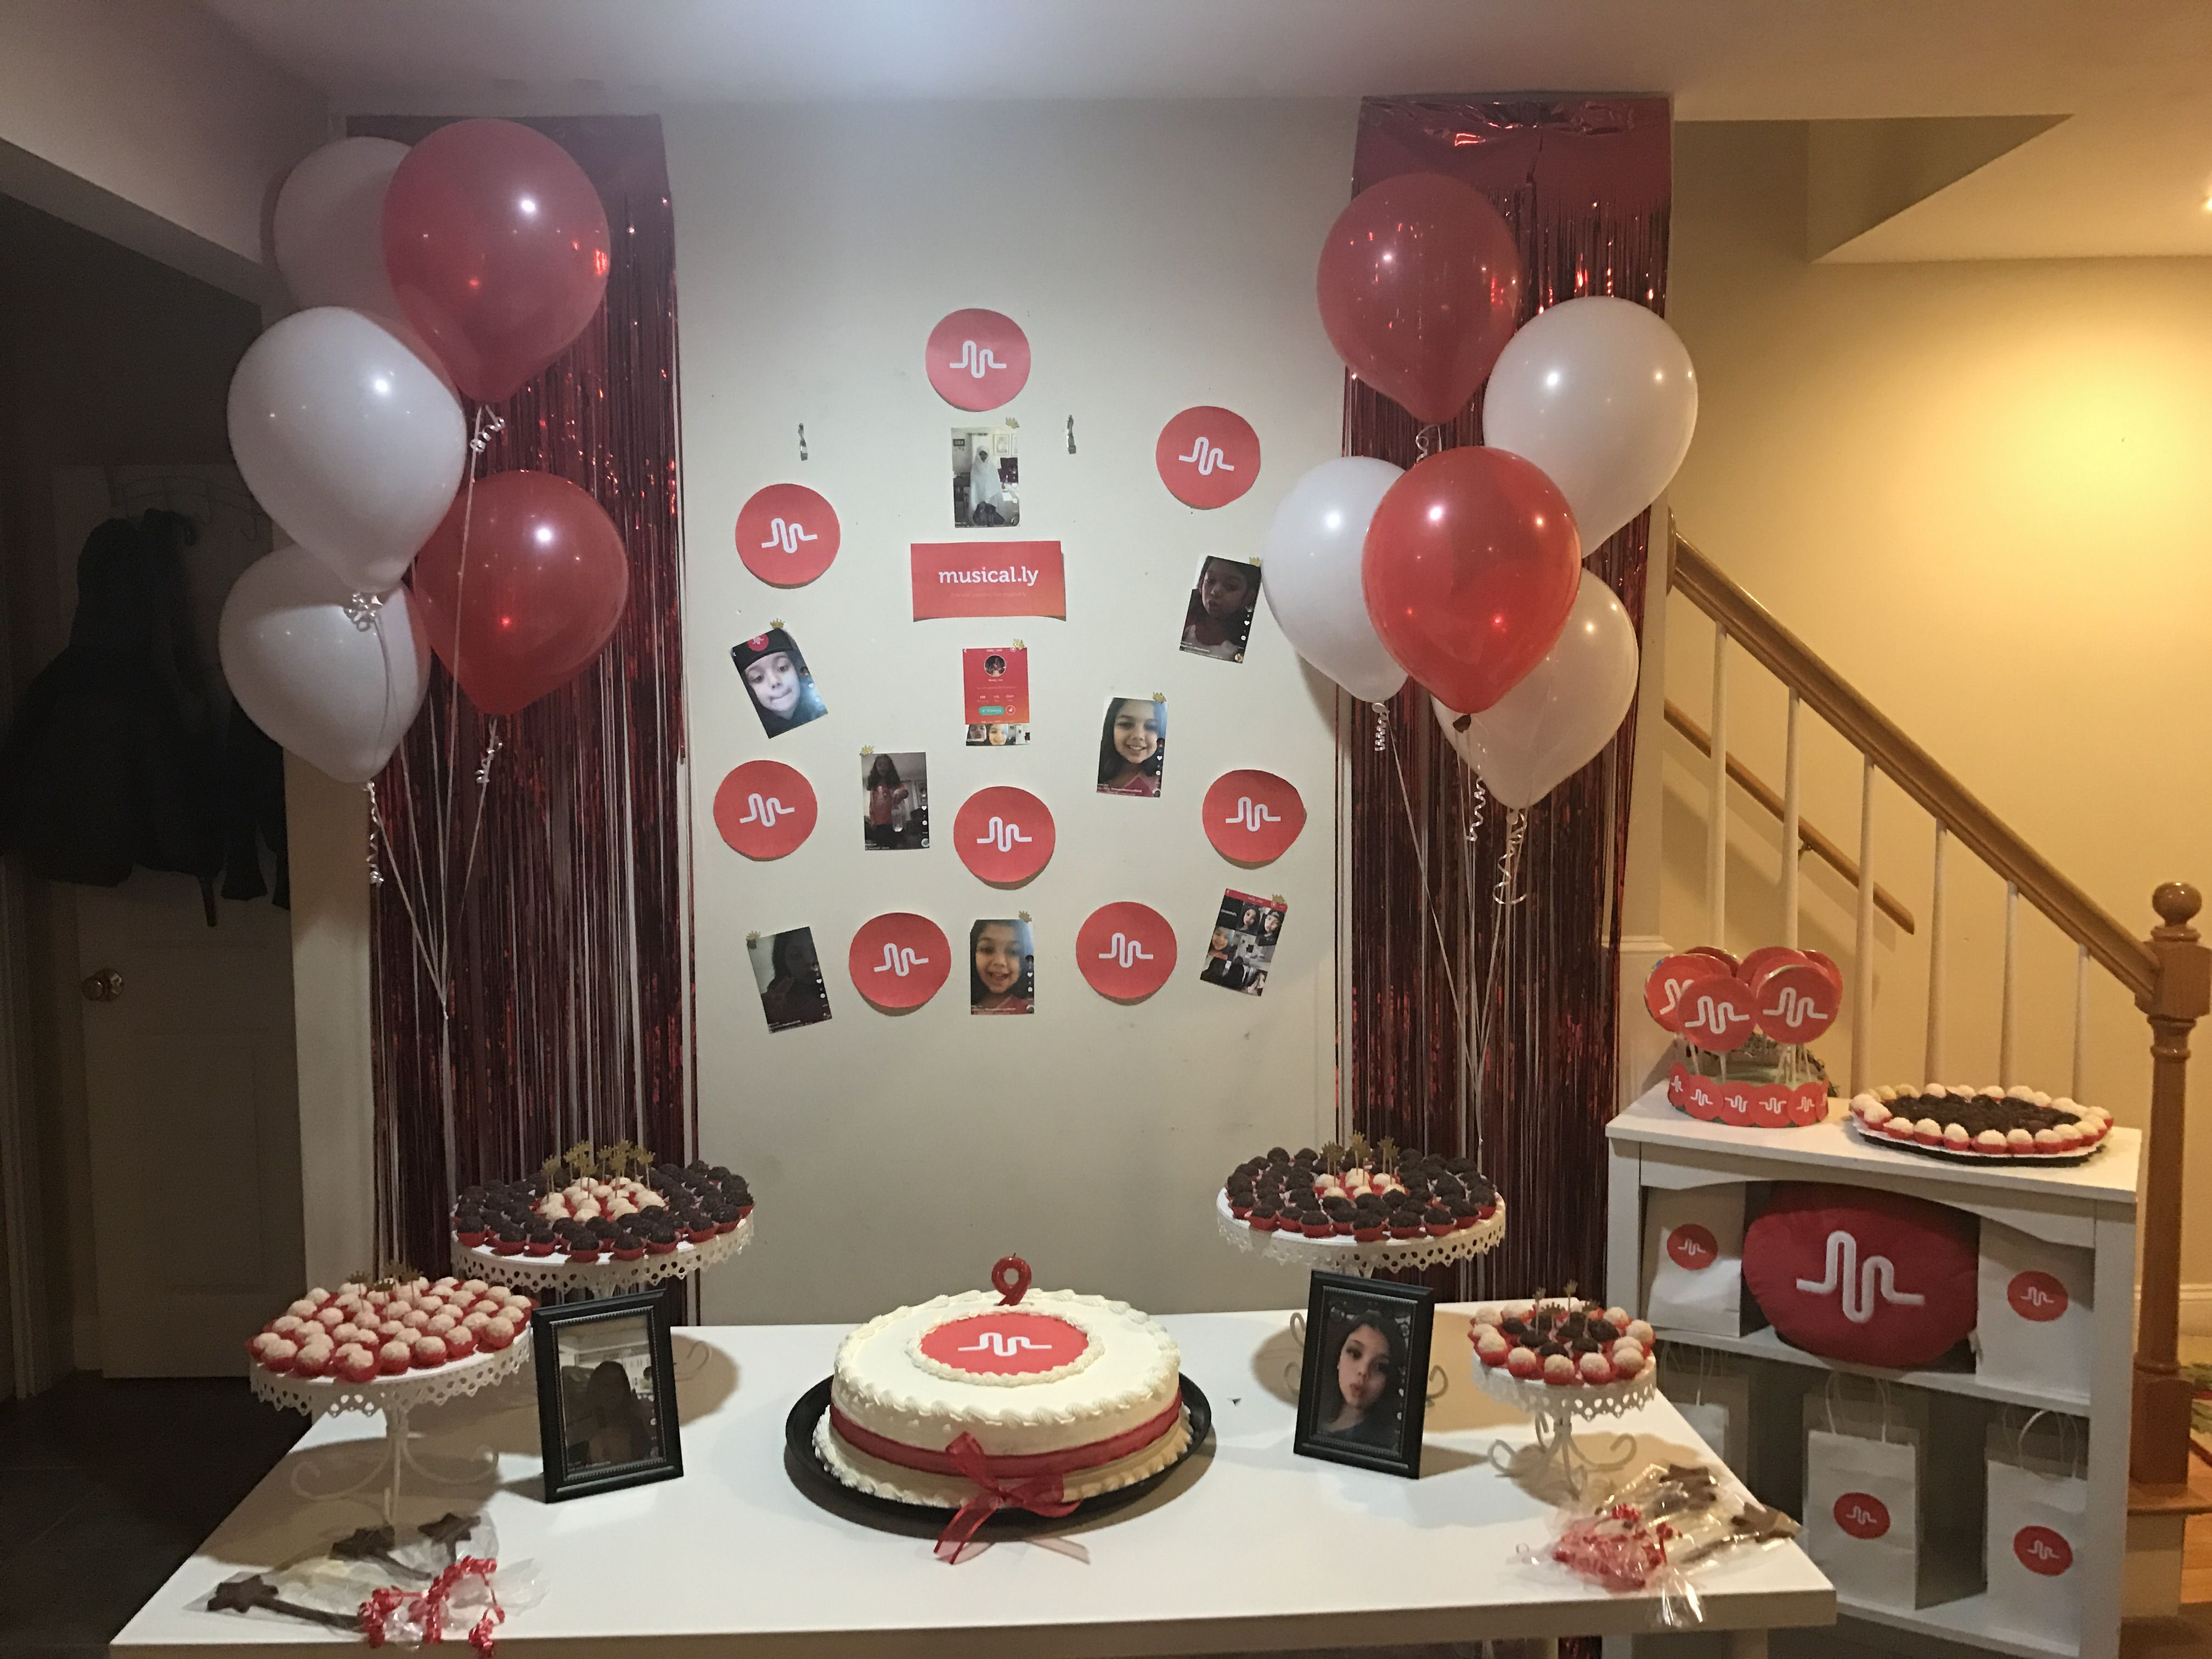 Birthday Birthday Party Ideas: Musical.ly Birthday Party